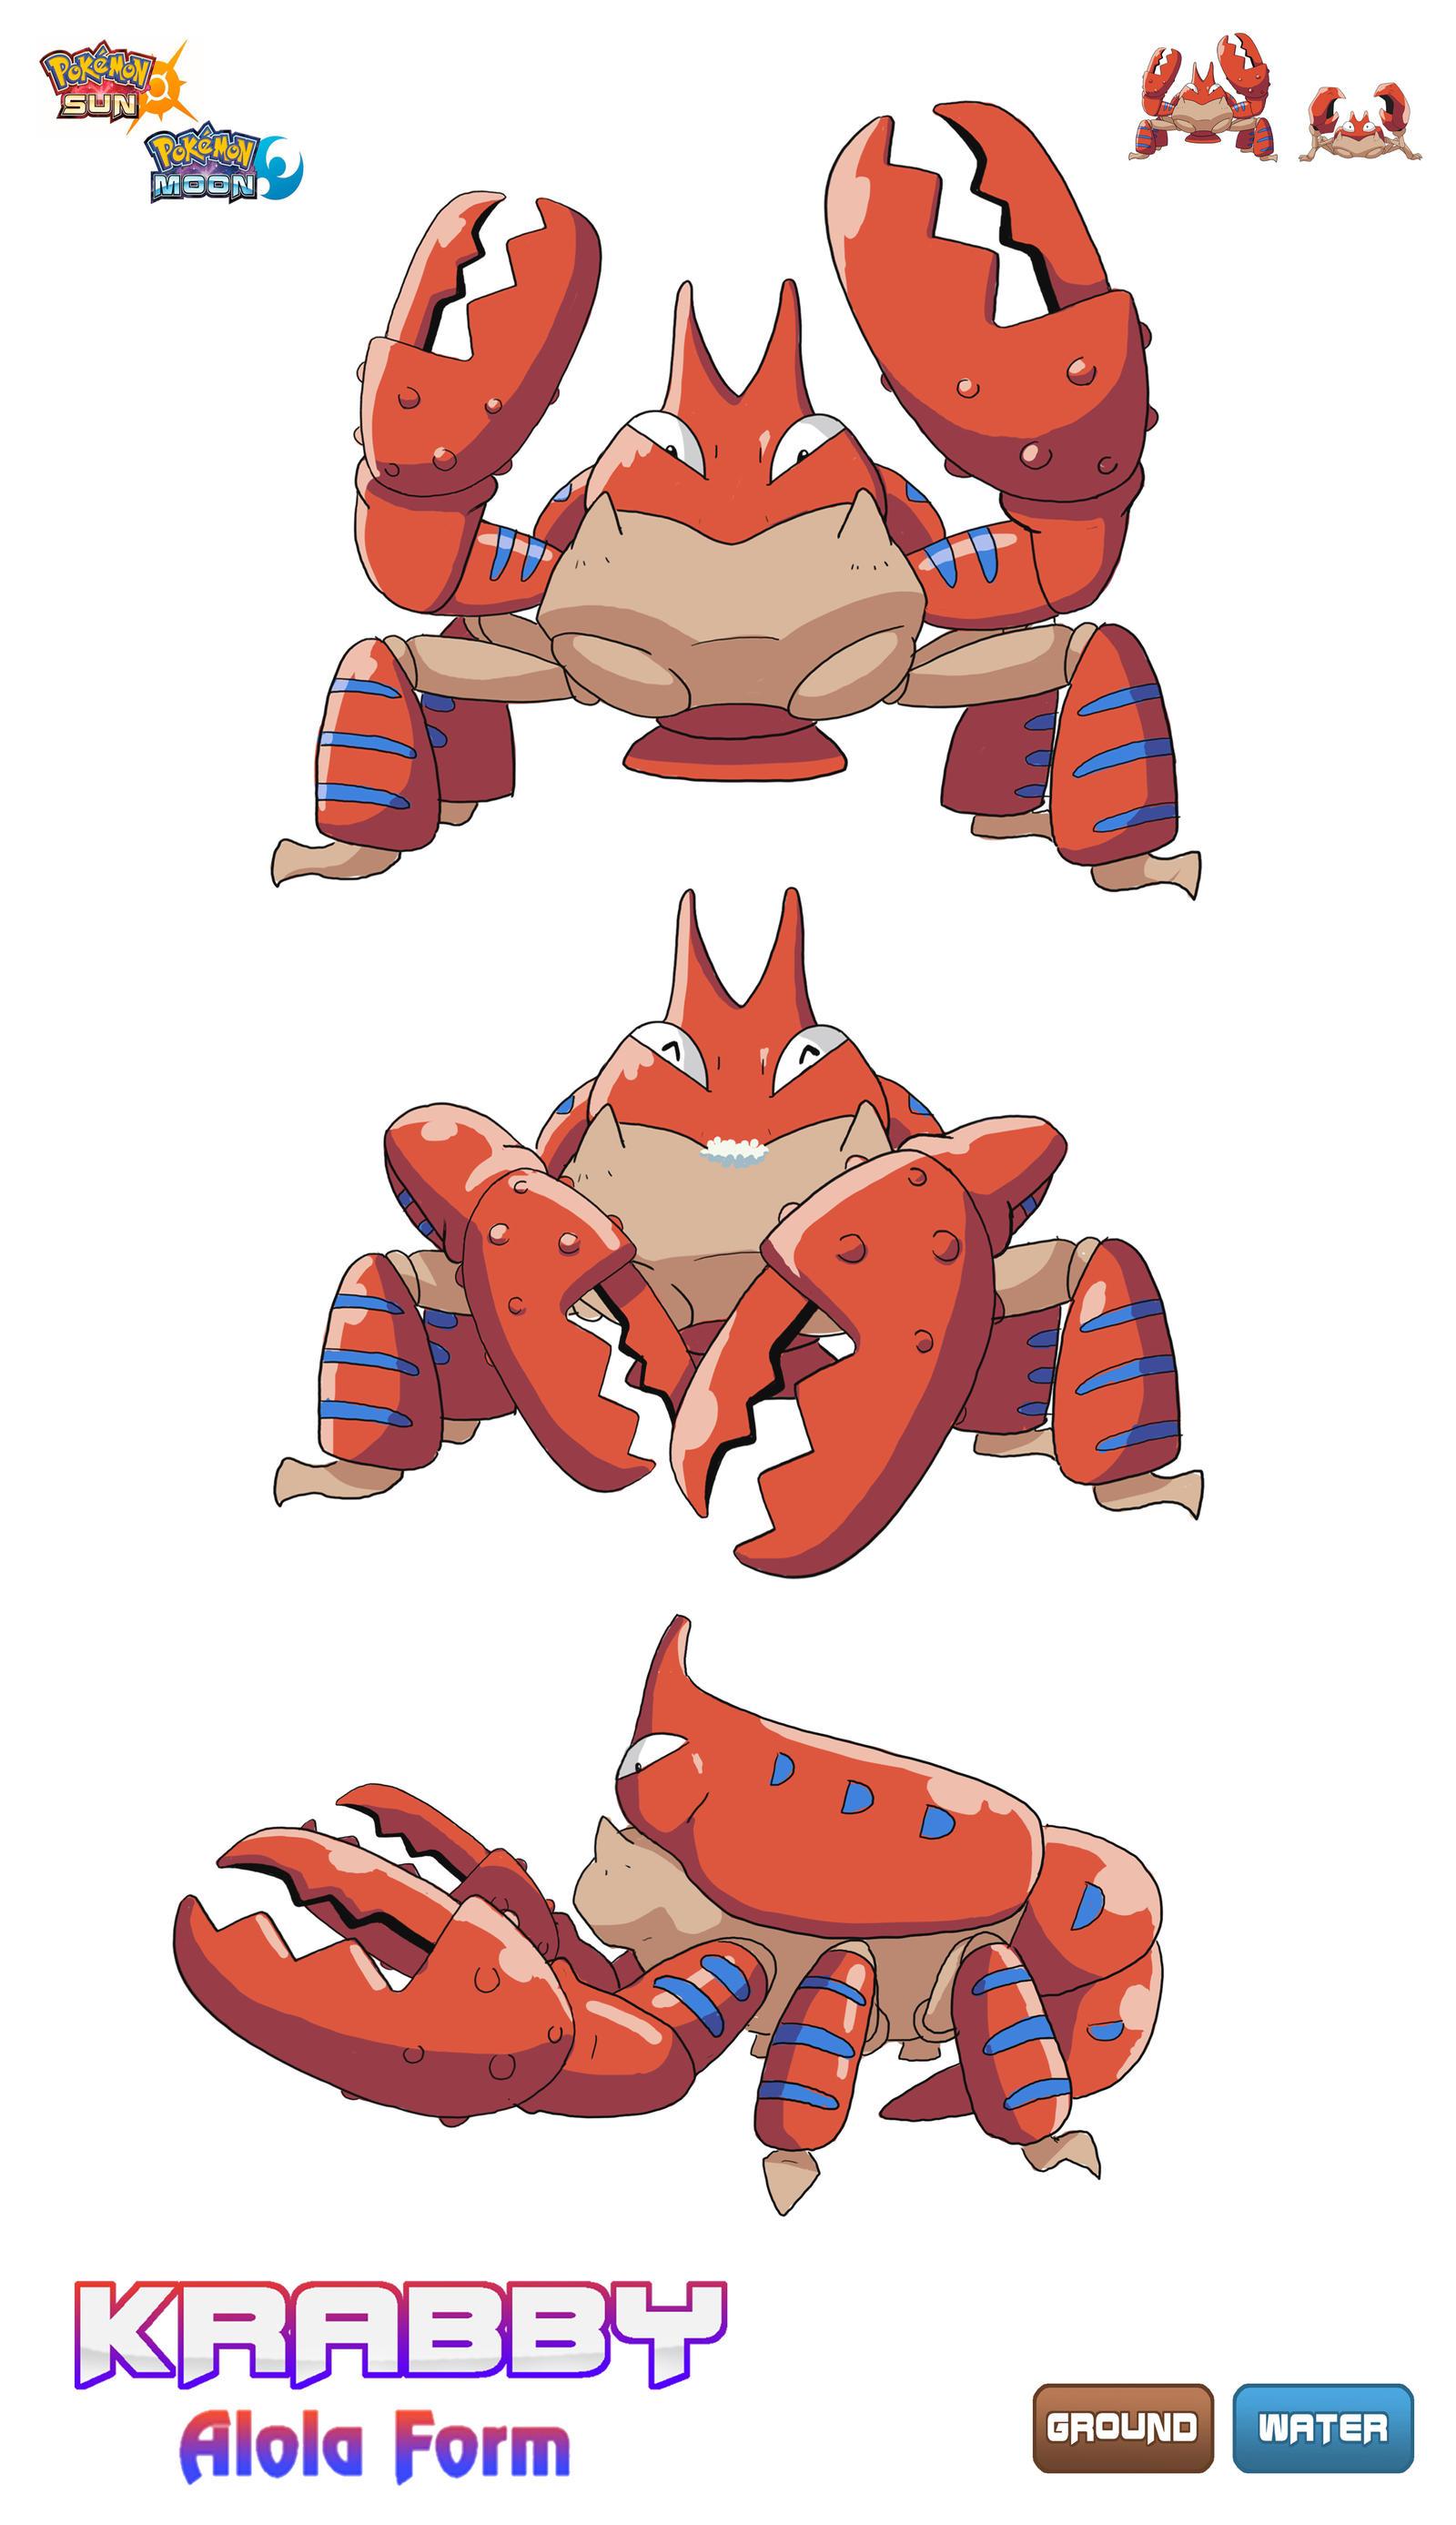 Pokemon Alola Geodude Images